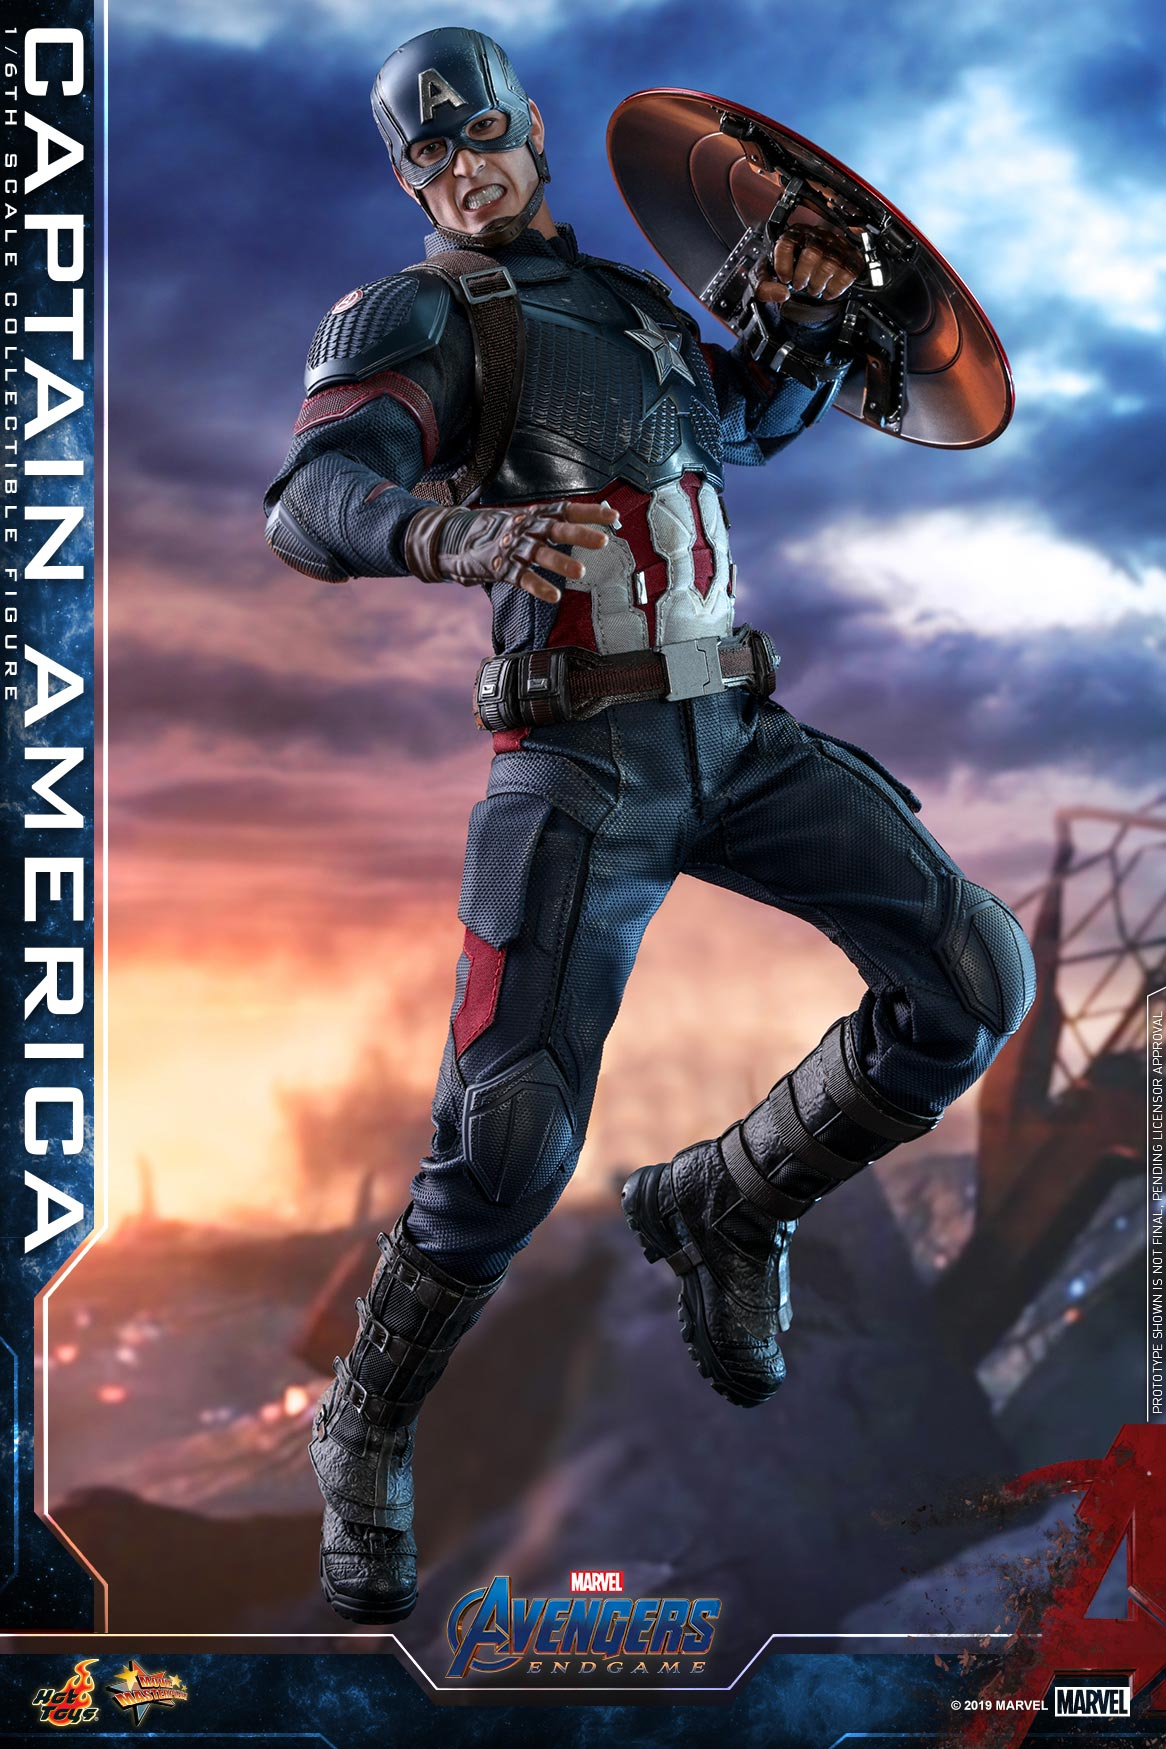 Hot-Toys---Avengers-4---Captain-America-collectible-figure_PR2